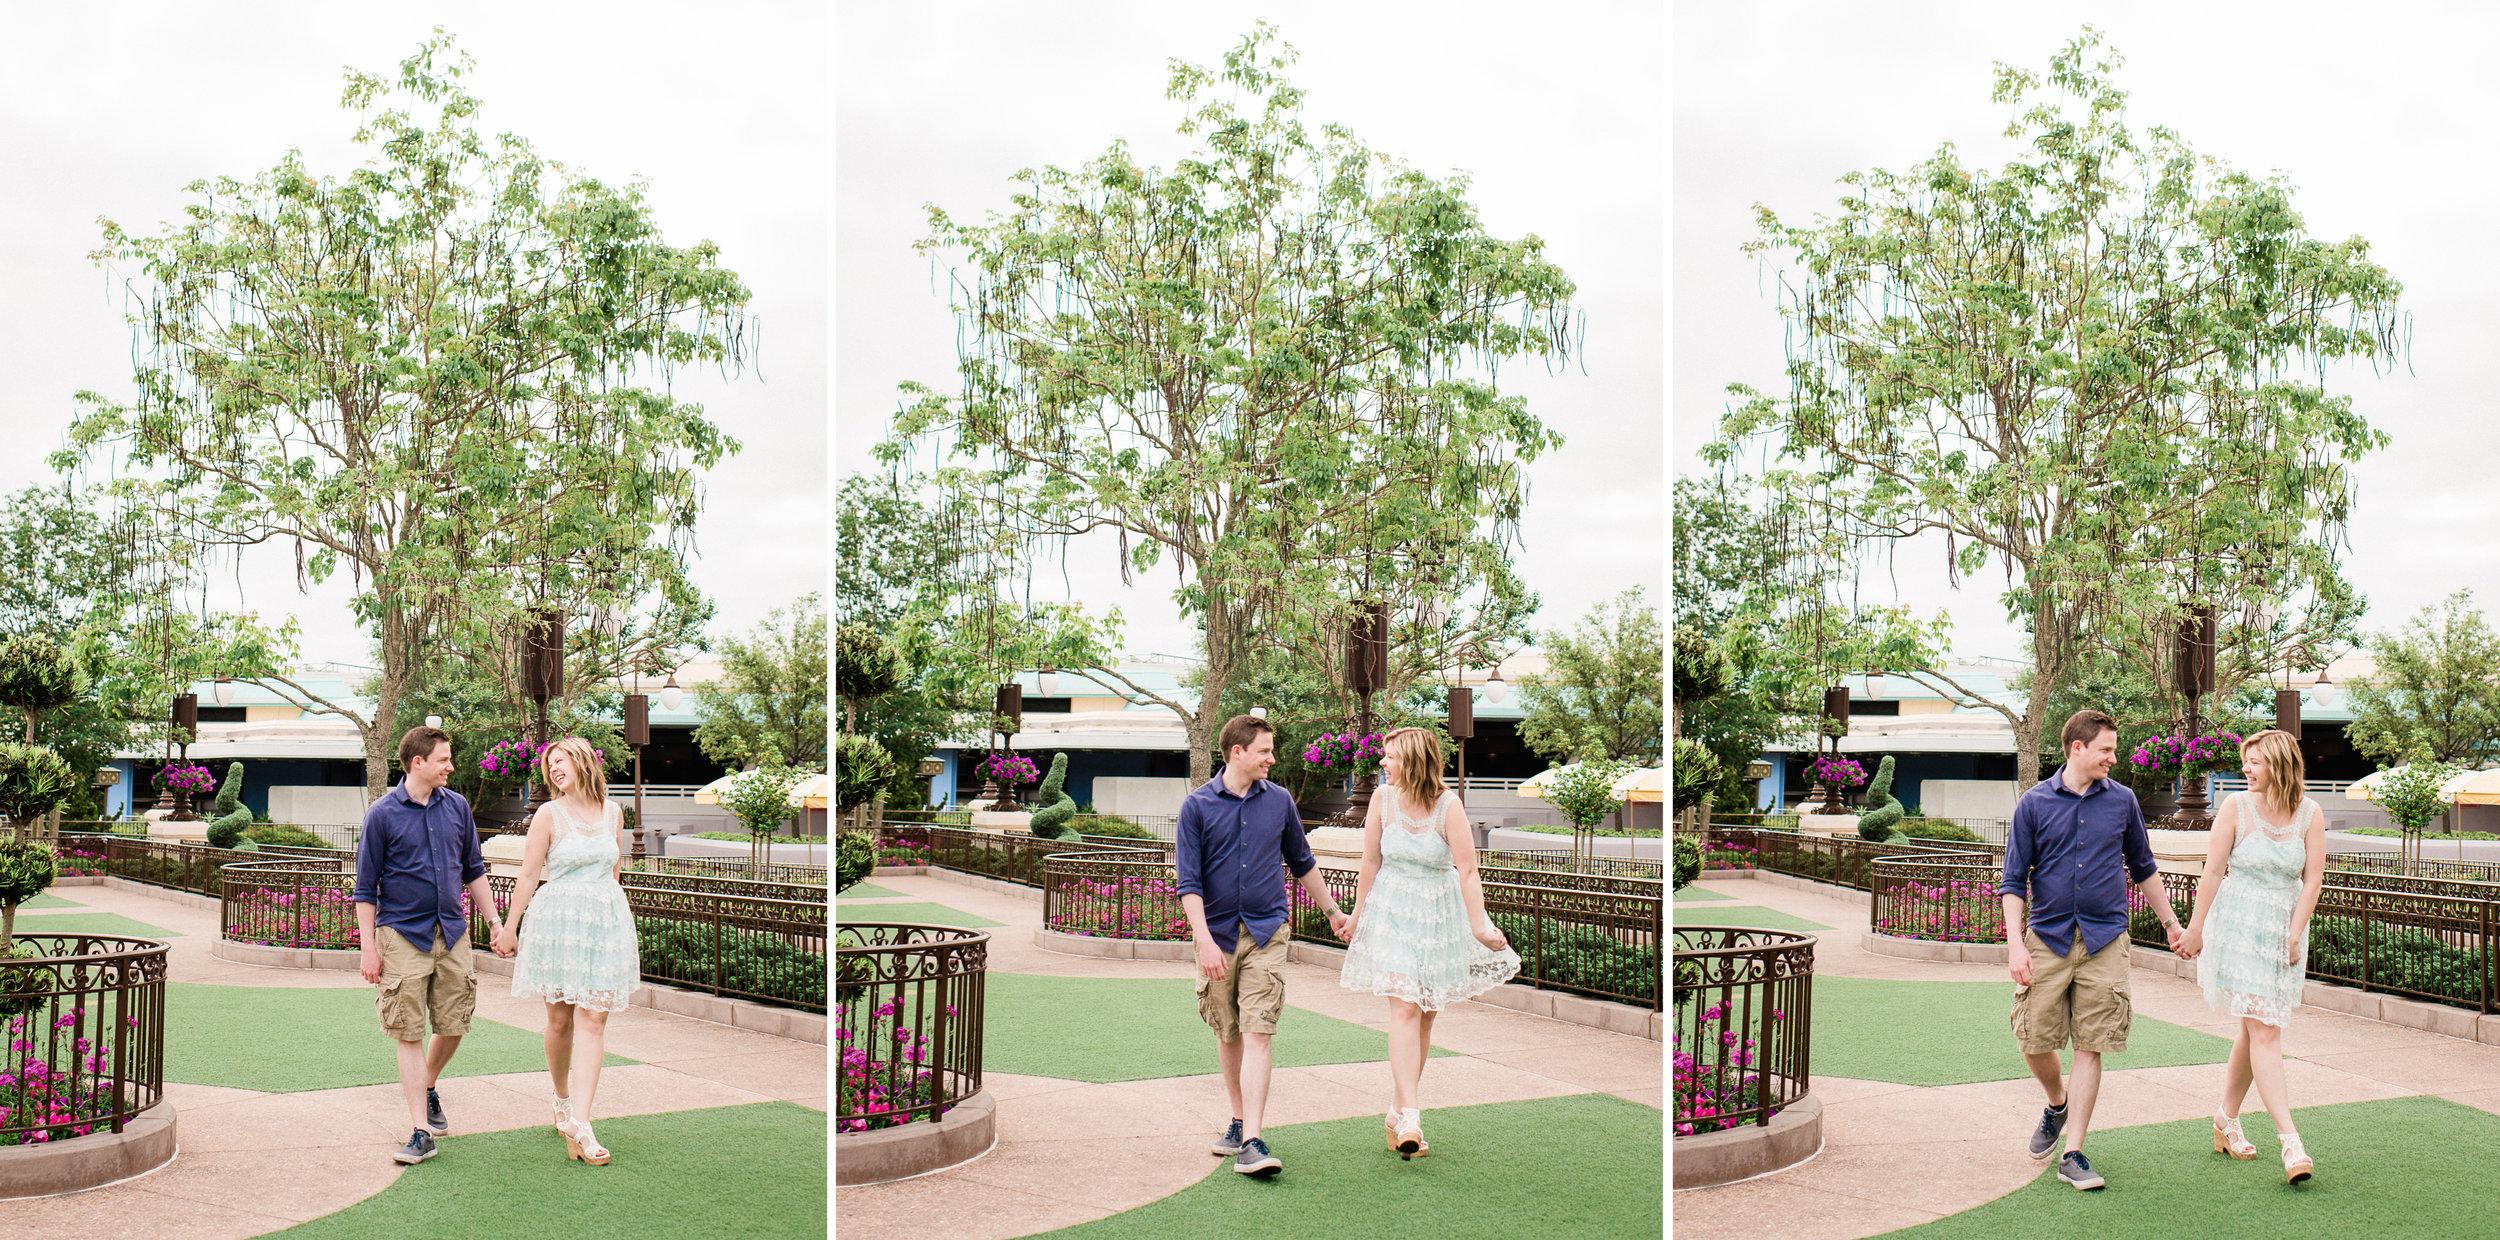 KateTaramykinStudios-Disney-World-Magic-Kingdom-Portraits-KristenDylan-9.jpg